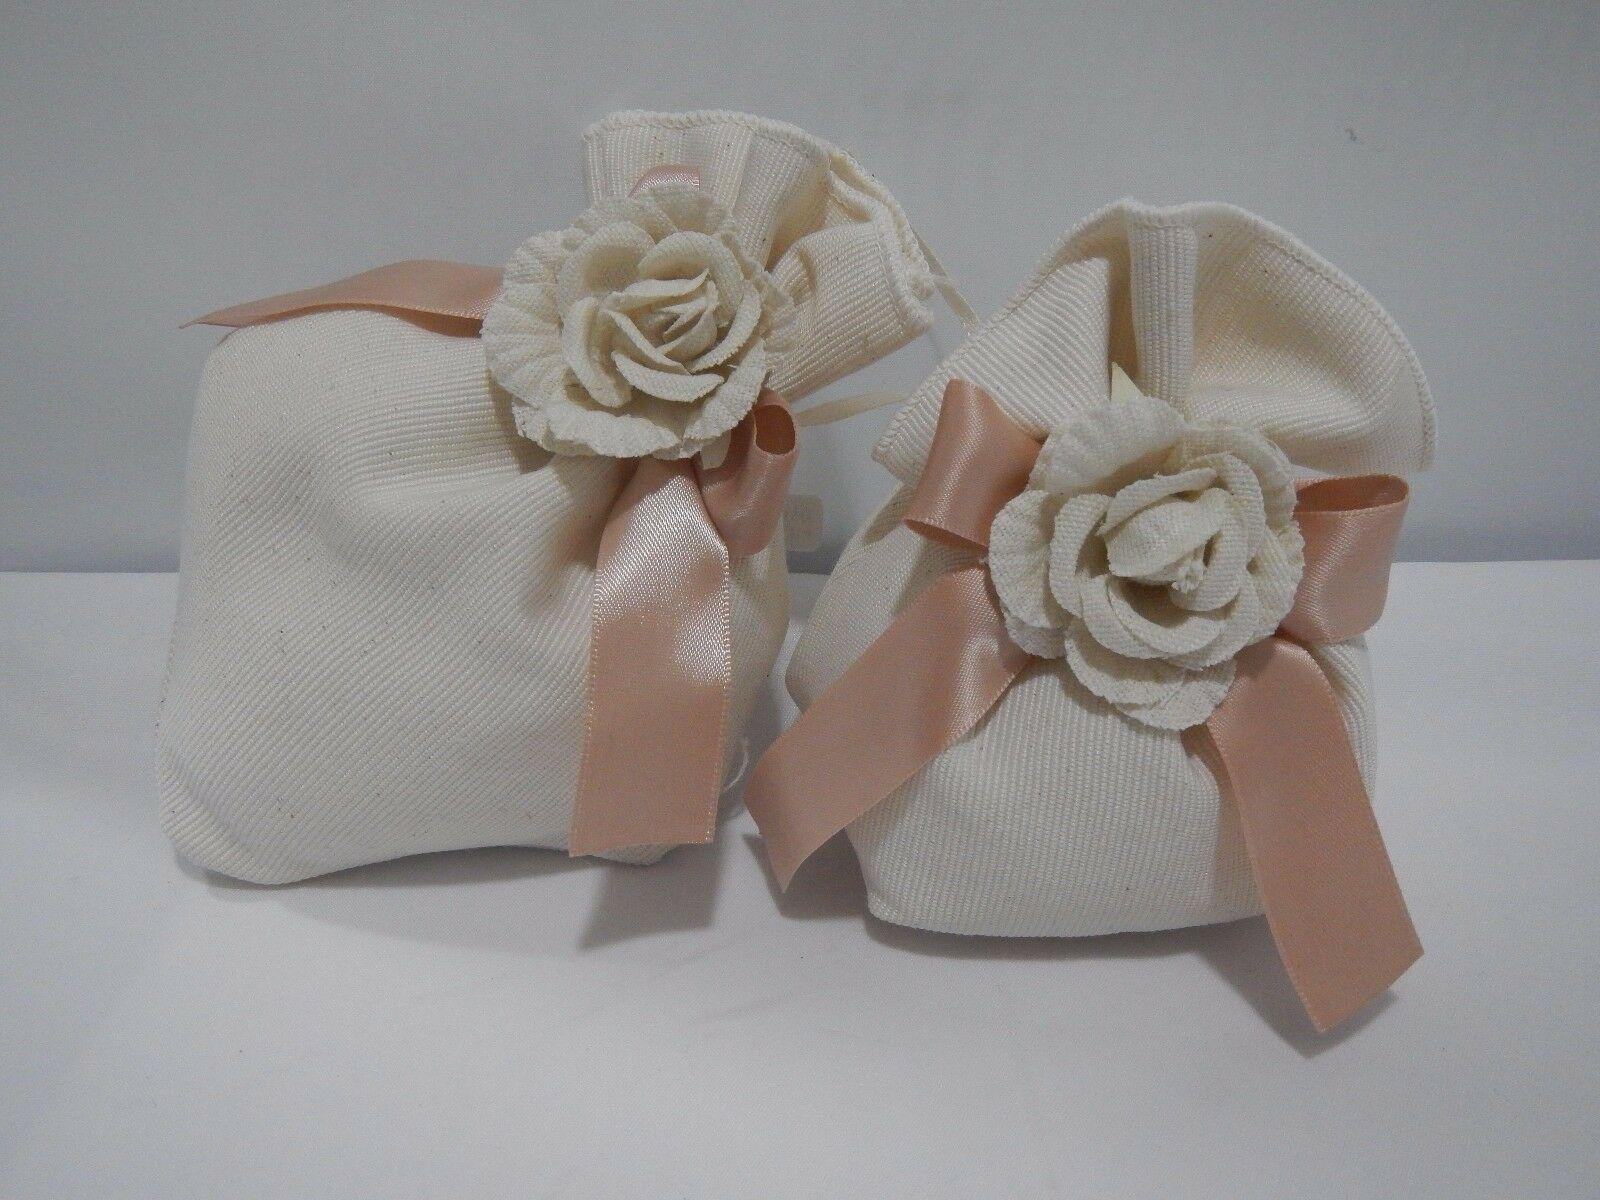 Kit 5 pz Bomboniera Sacchetti con rosa Cuorematto D5157 D5156 D5159 D5158 D5161